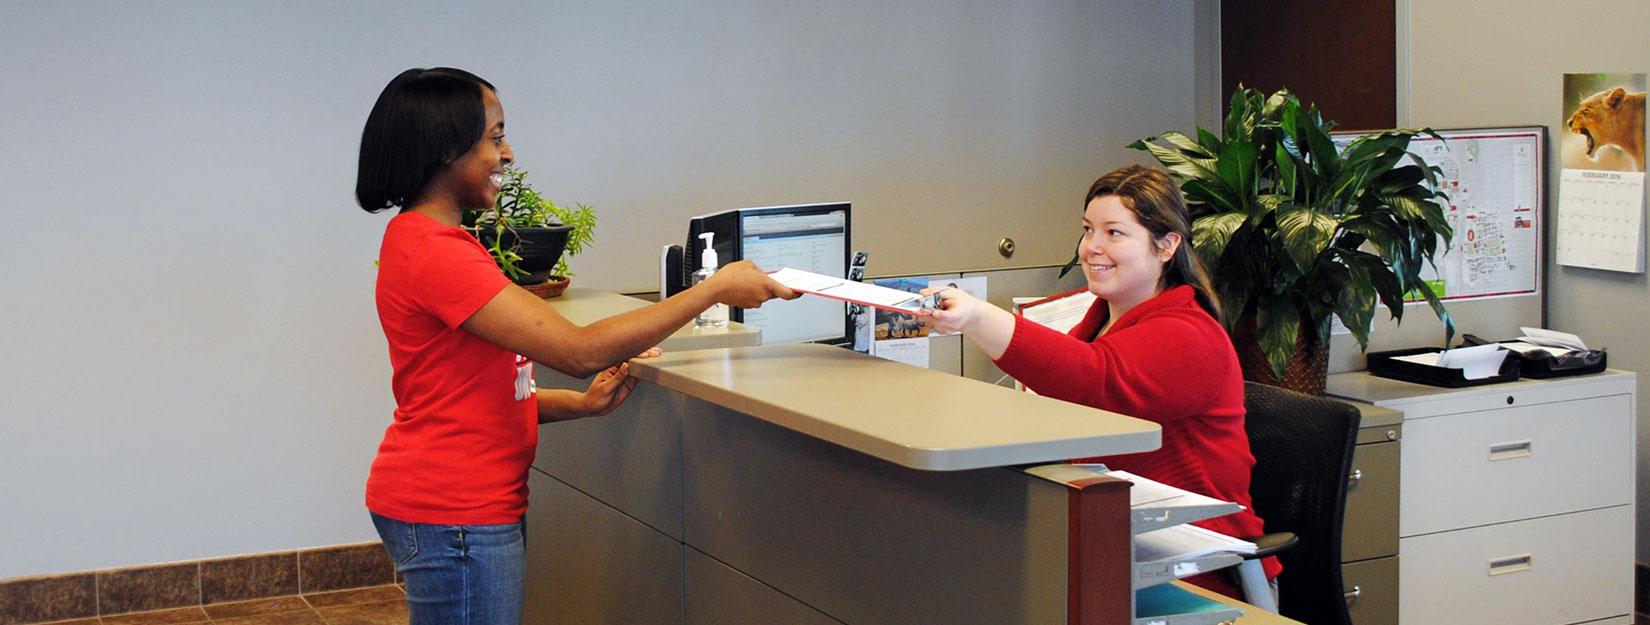 customer service representative helping an employee